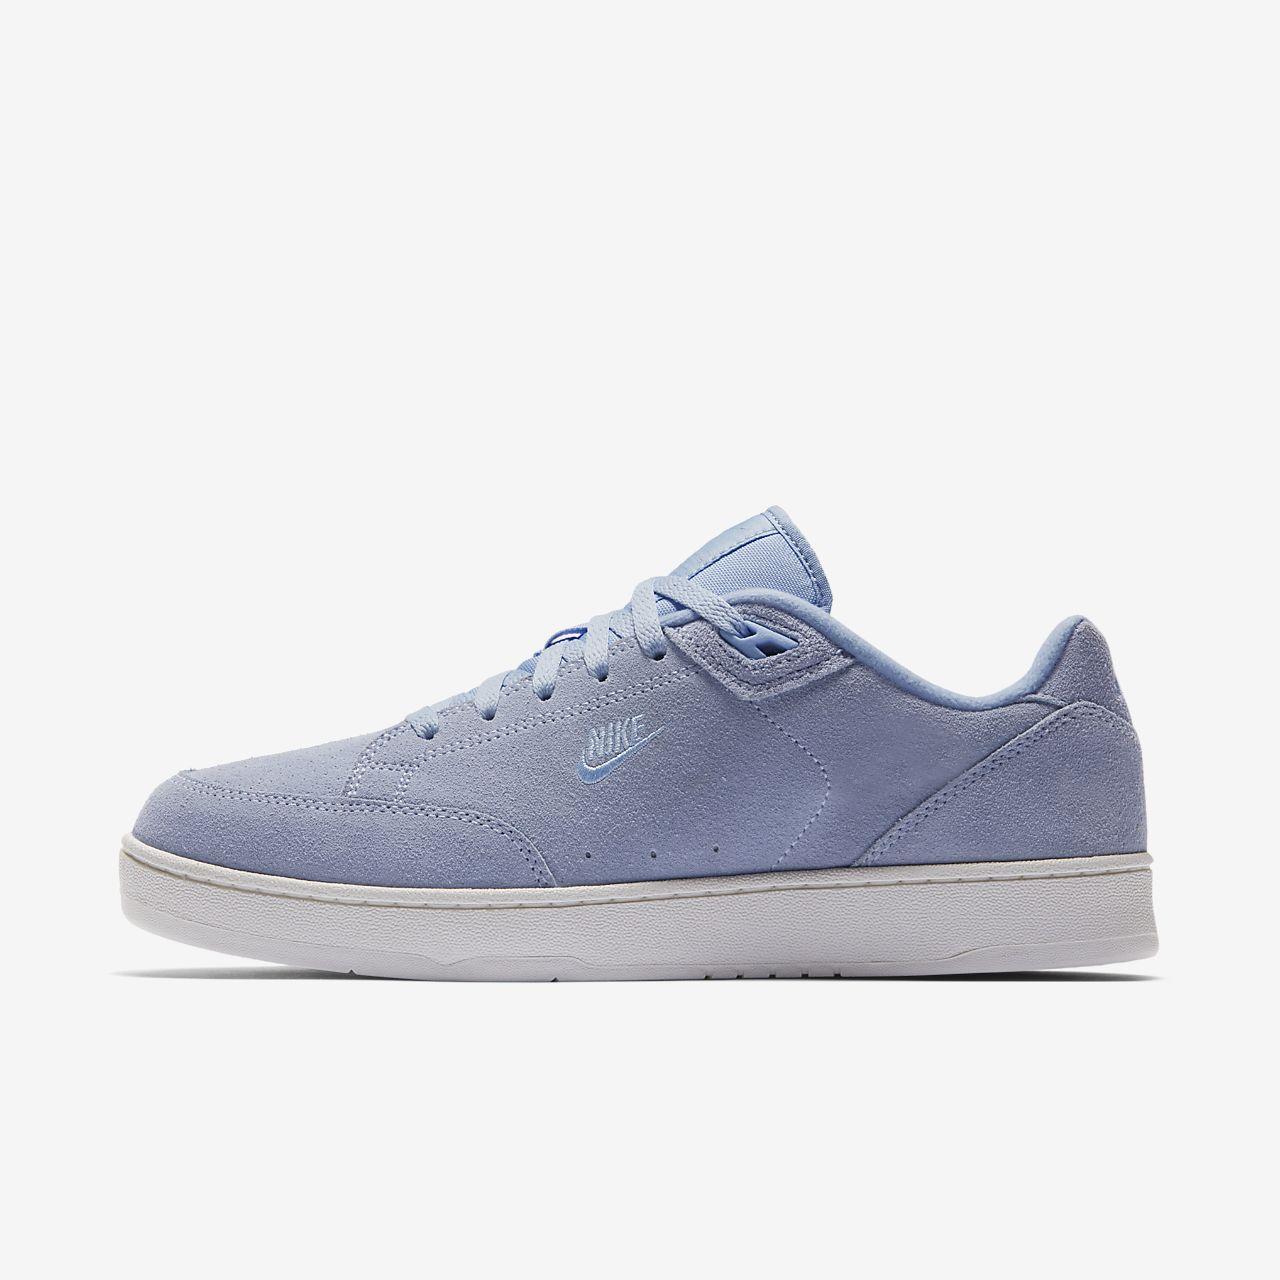 uk availability 068dd 92730 ... Scarpa Nike Grandstand II Suede - Uomo